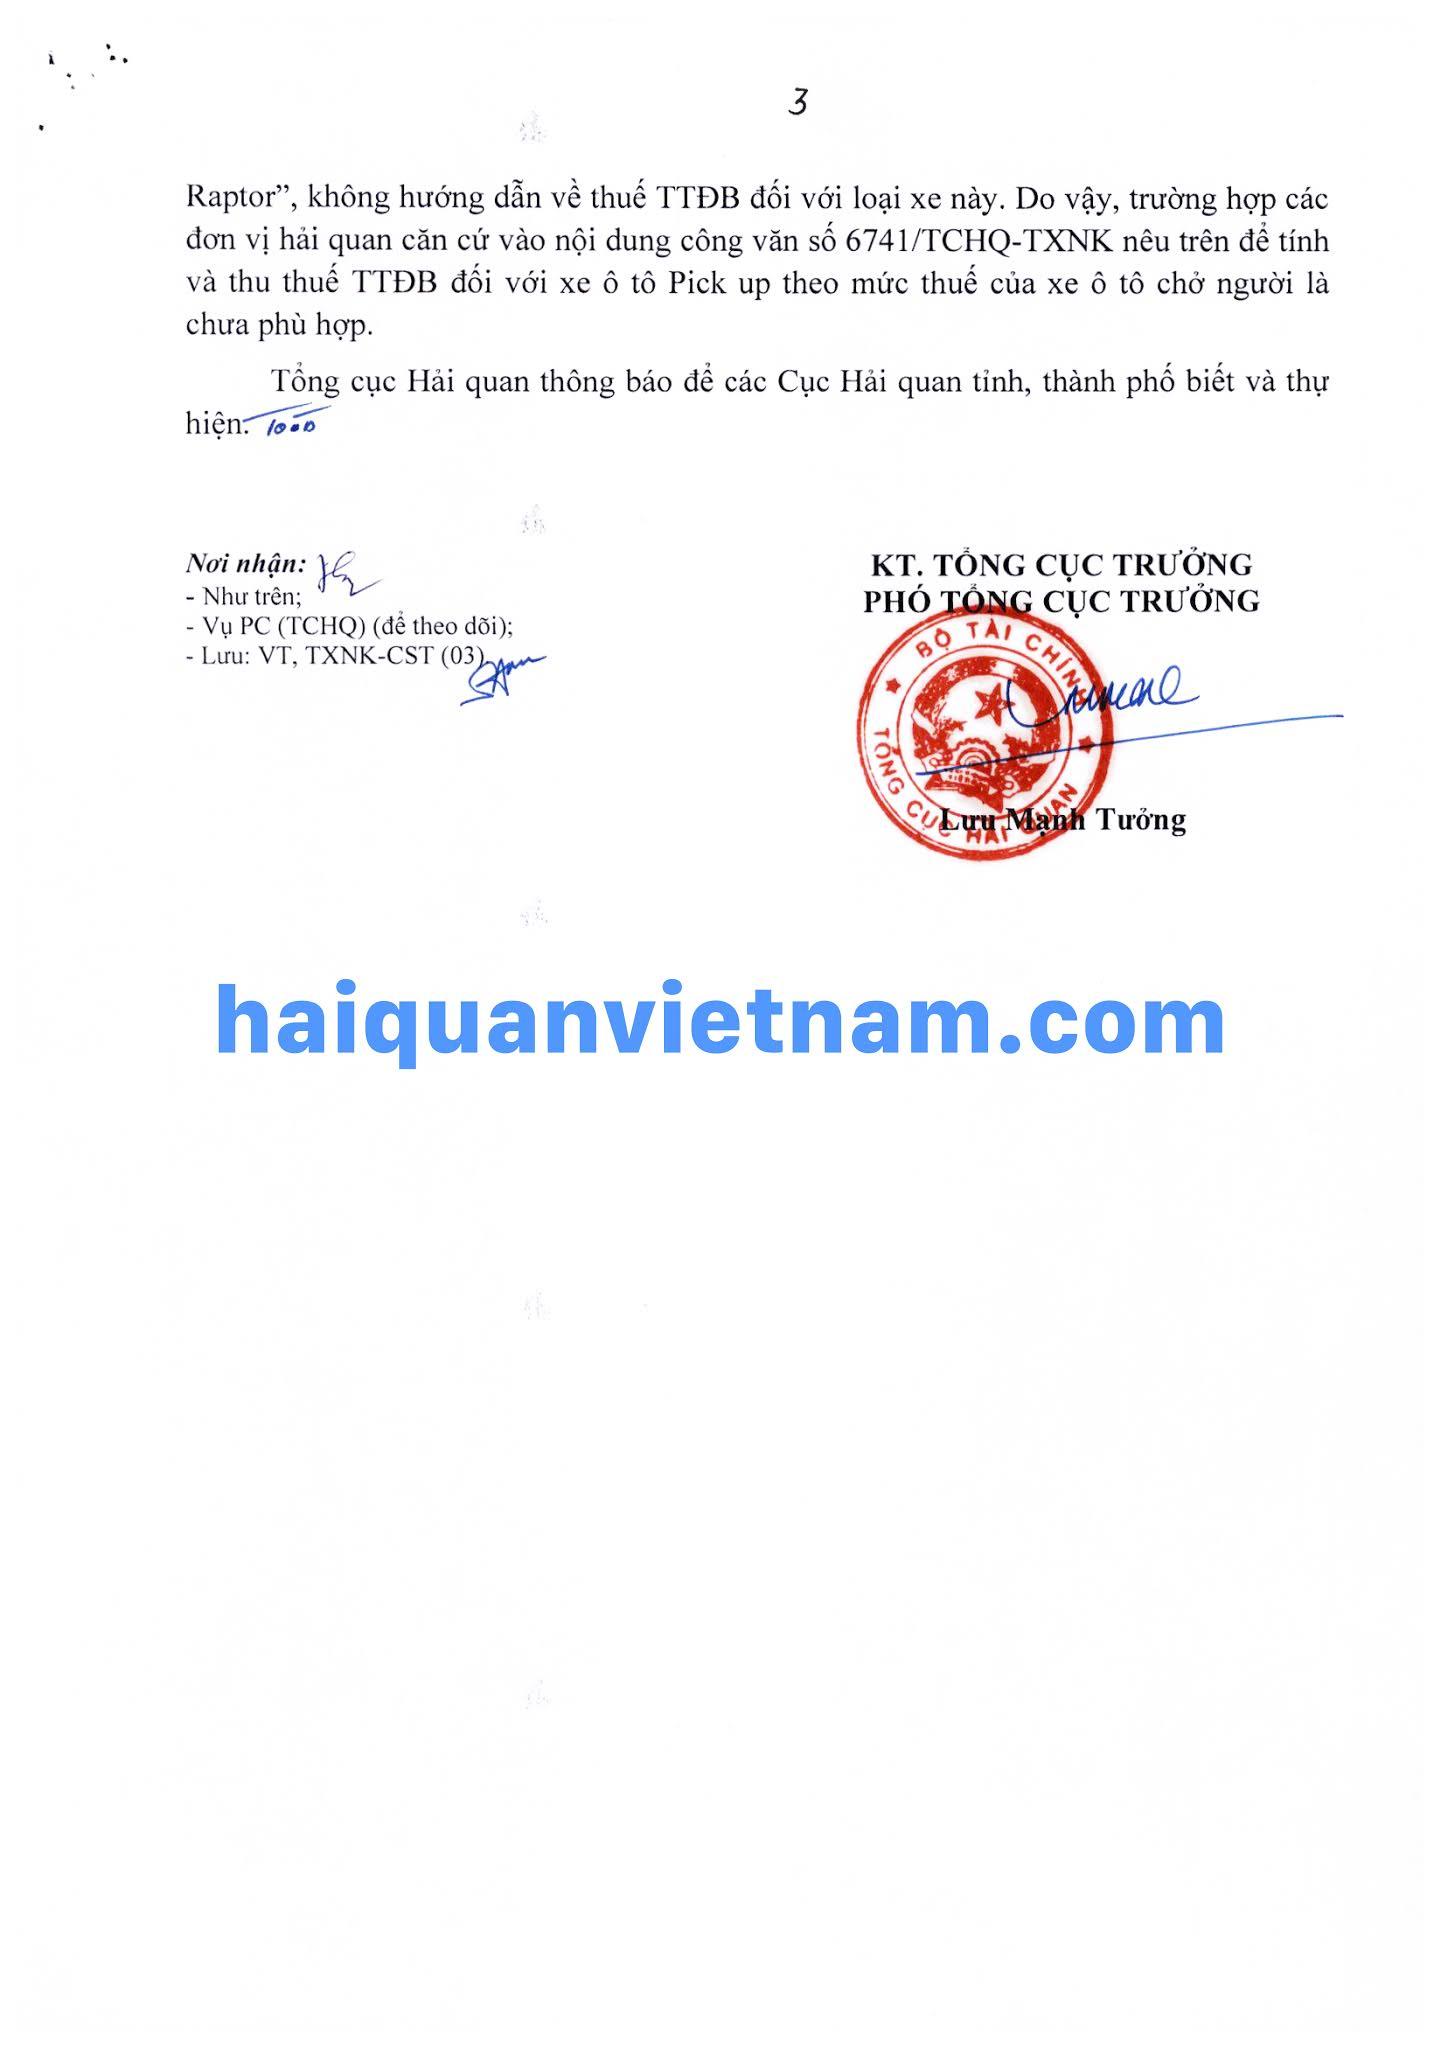 [Image: 210702-3335-TCHQ-TXNK_haiquanvietnam_03.jpg]